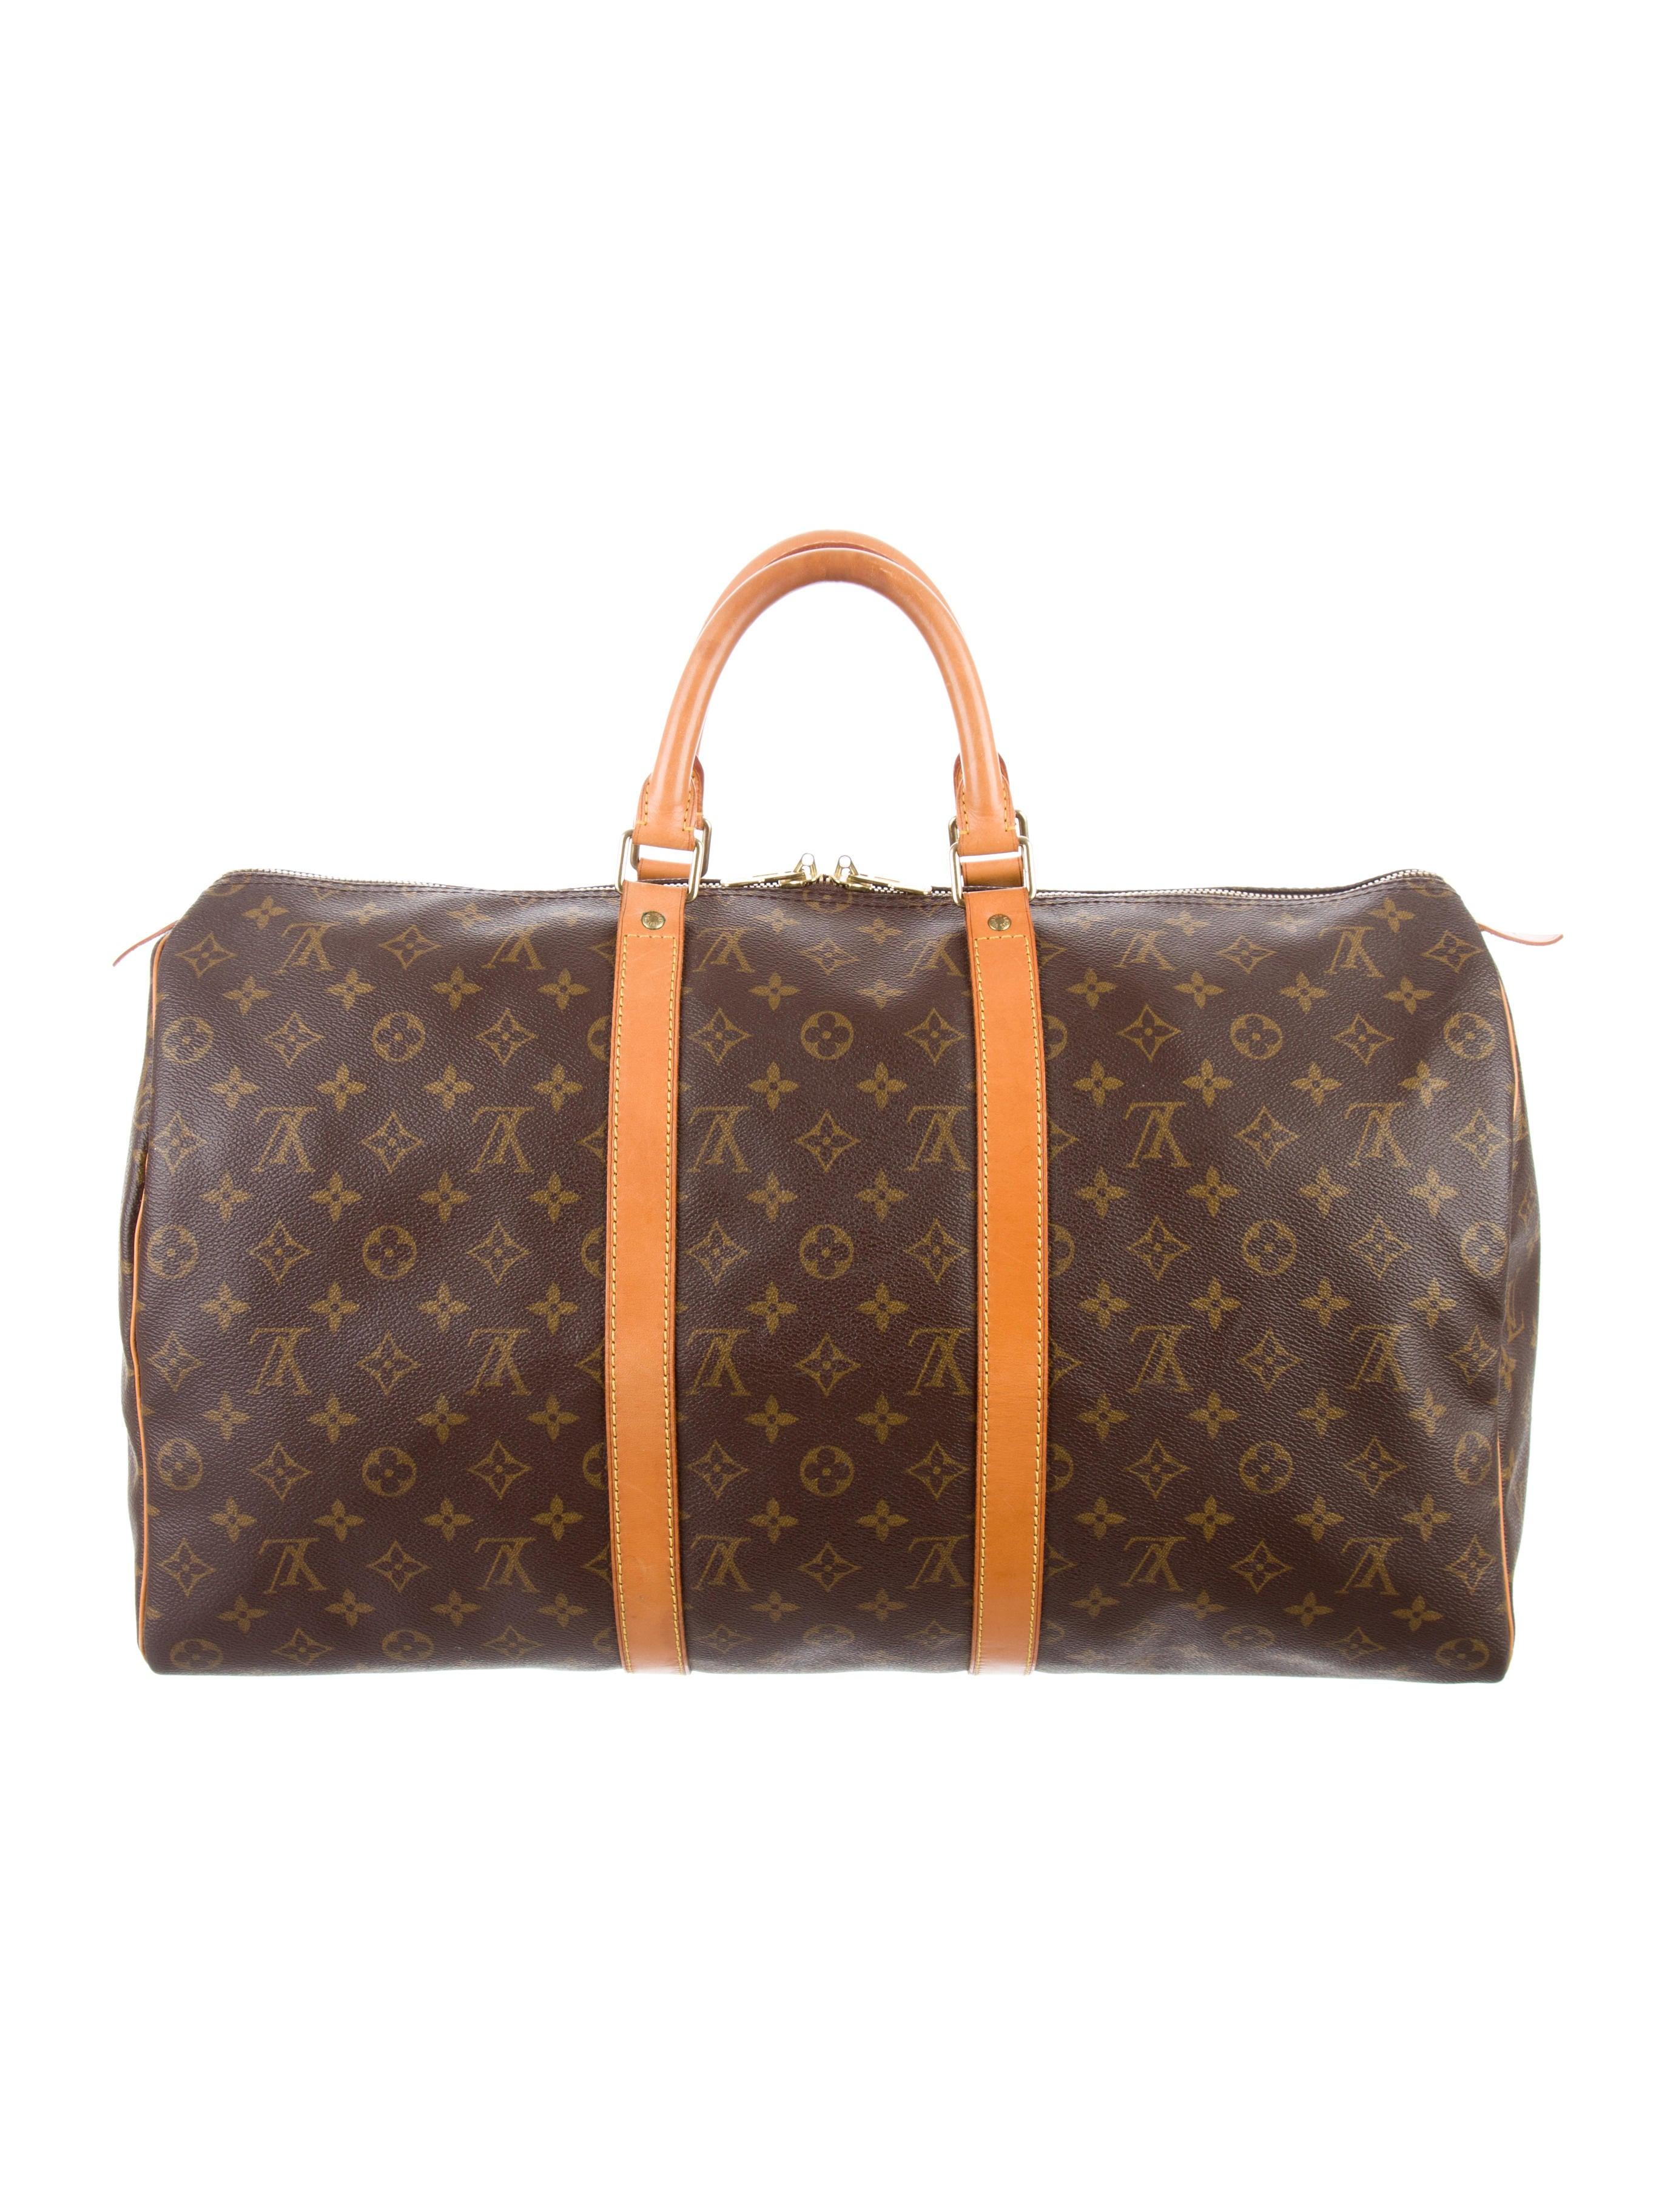 louis vuitton monogram keepall 50 handbags lou129783. Black Bedroom Furniture Sets. Home Design Ideas